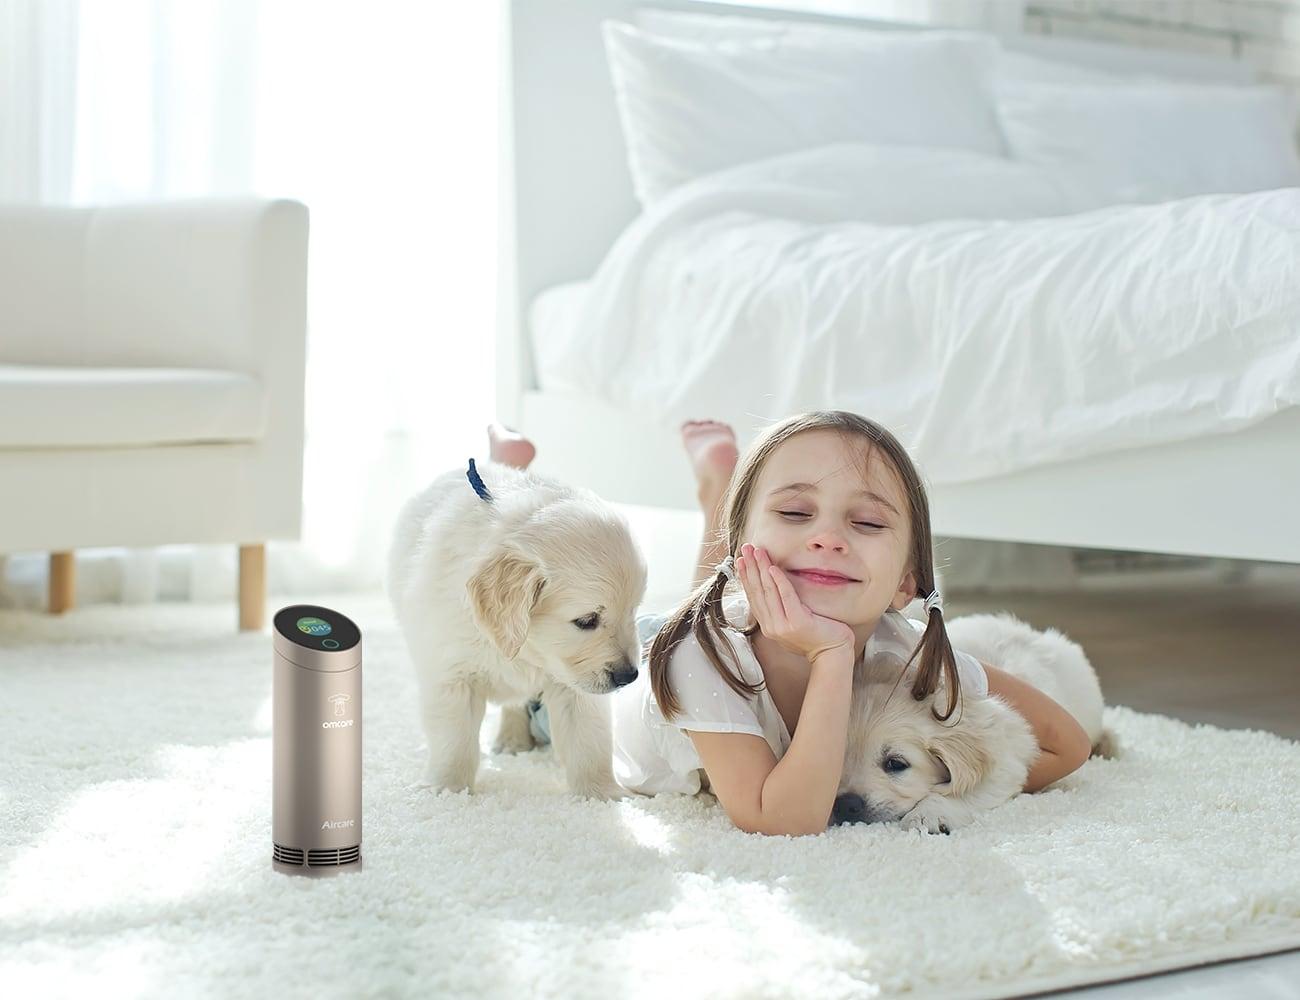 OMCARE Portable Air Purifier